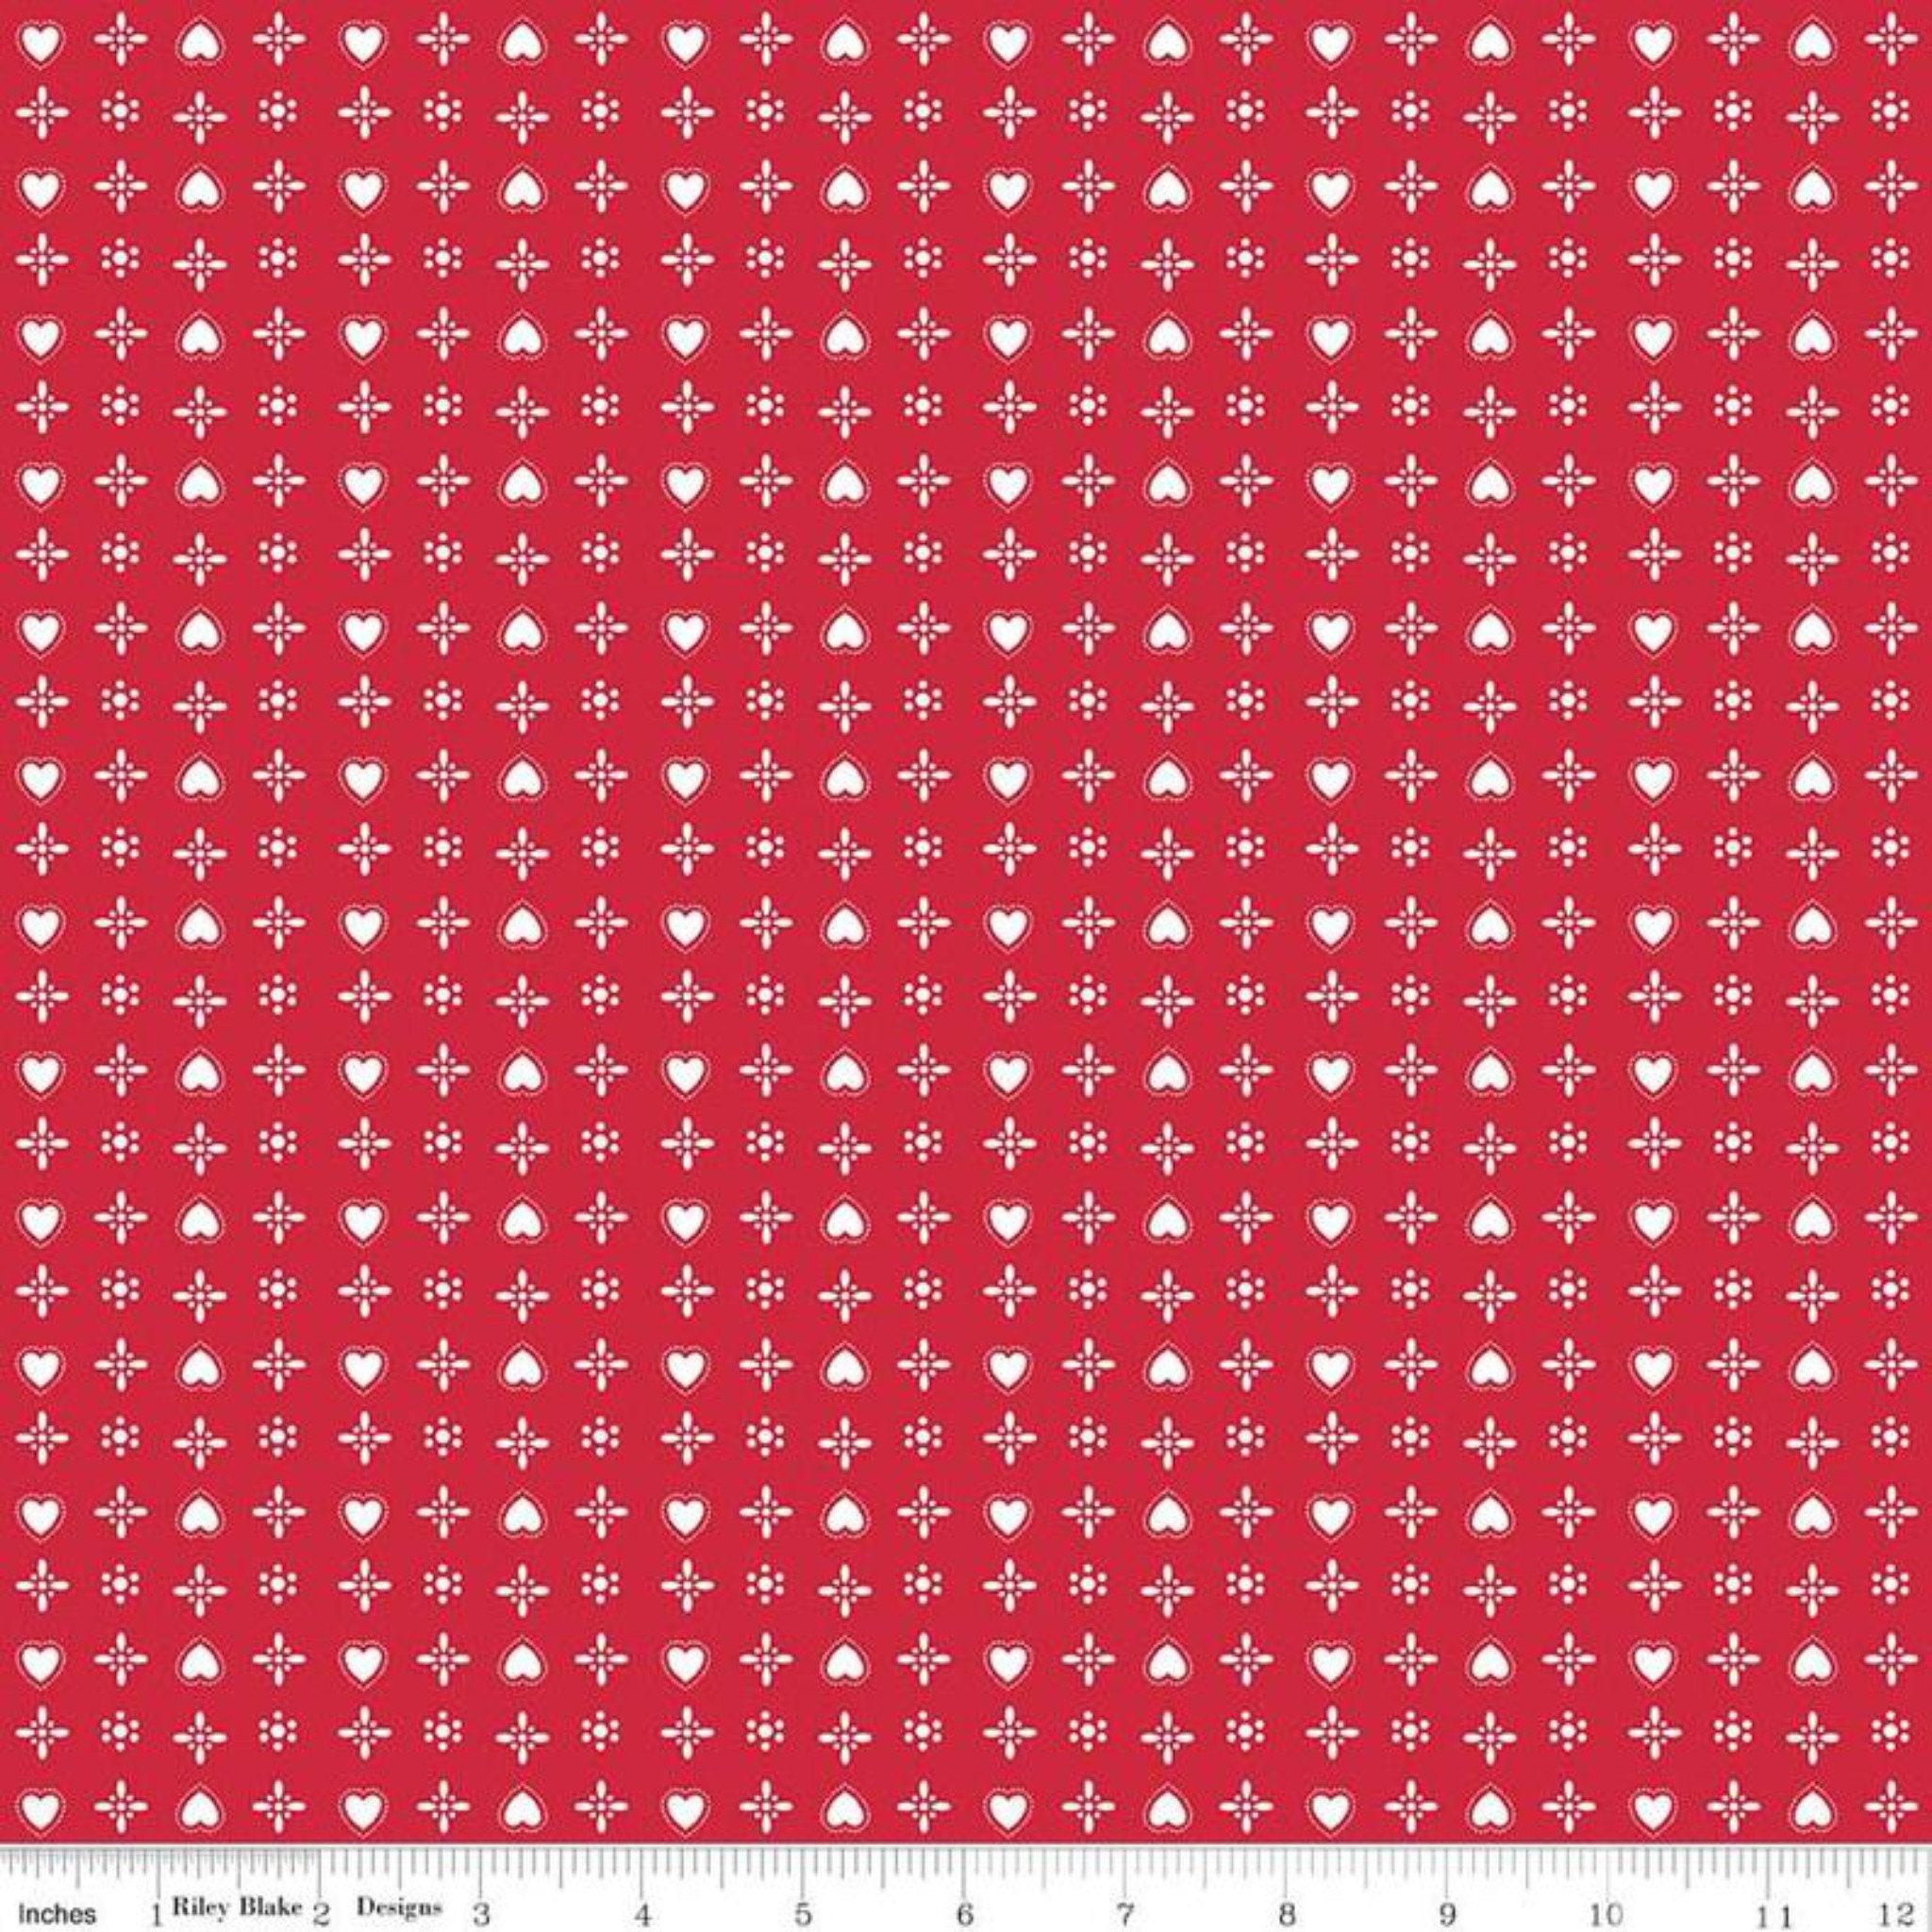 Moda Penny Rose CHRISTMAS SPECIAL 100/% COTTON FABRIC HIGH END FAT QUARTERS